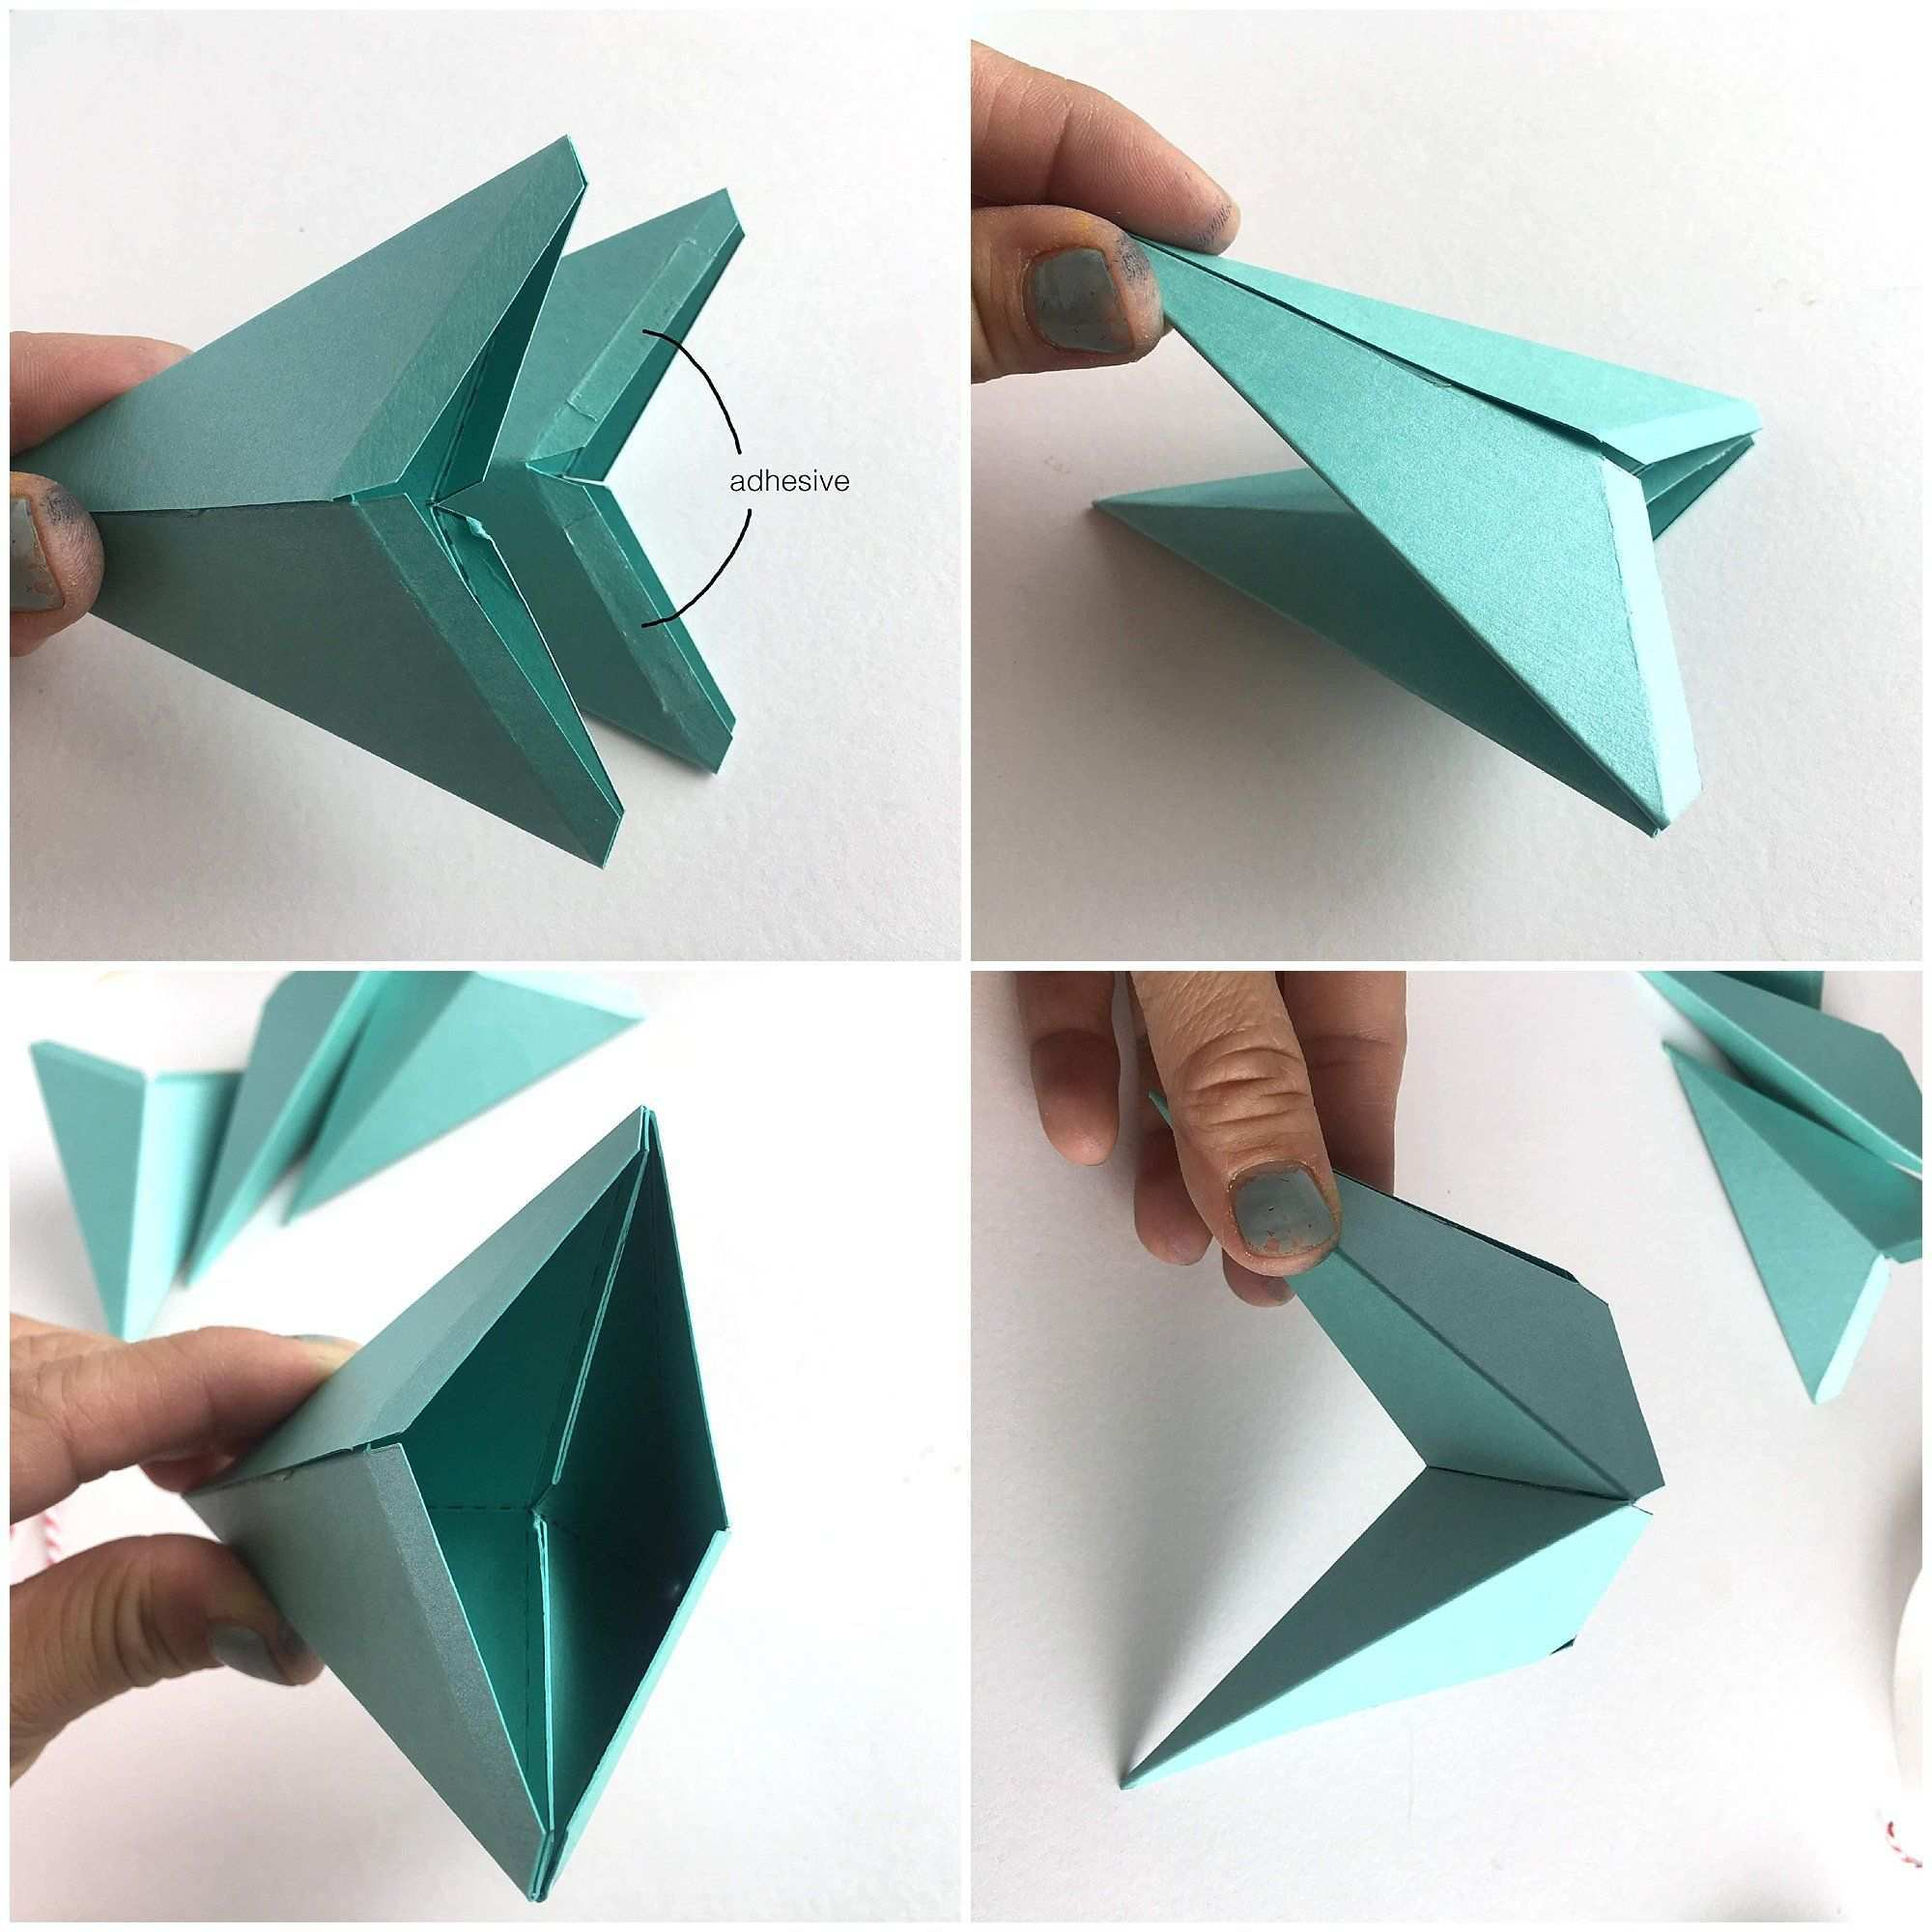 Diy 3d Paper Stars Decor In 2020 Paper Stars 3d Paper Star Diy Kite Decorations